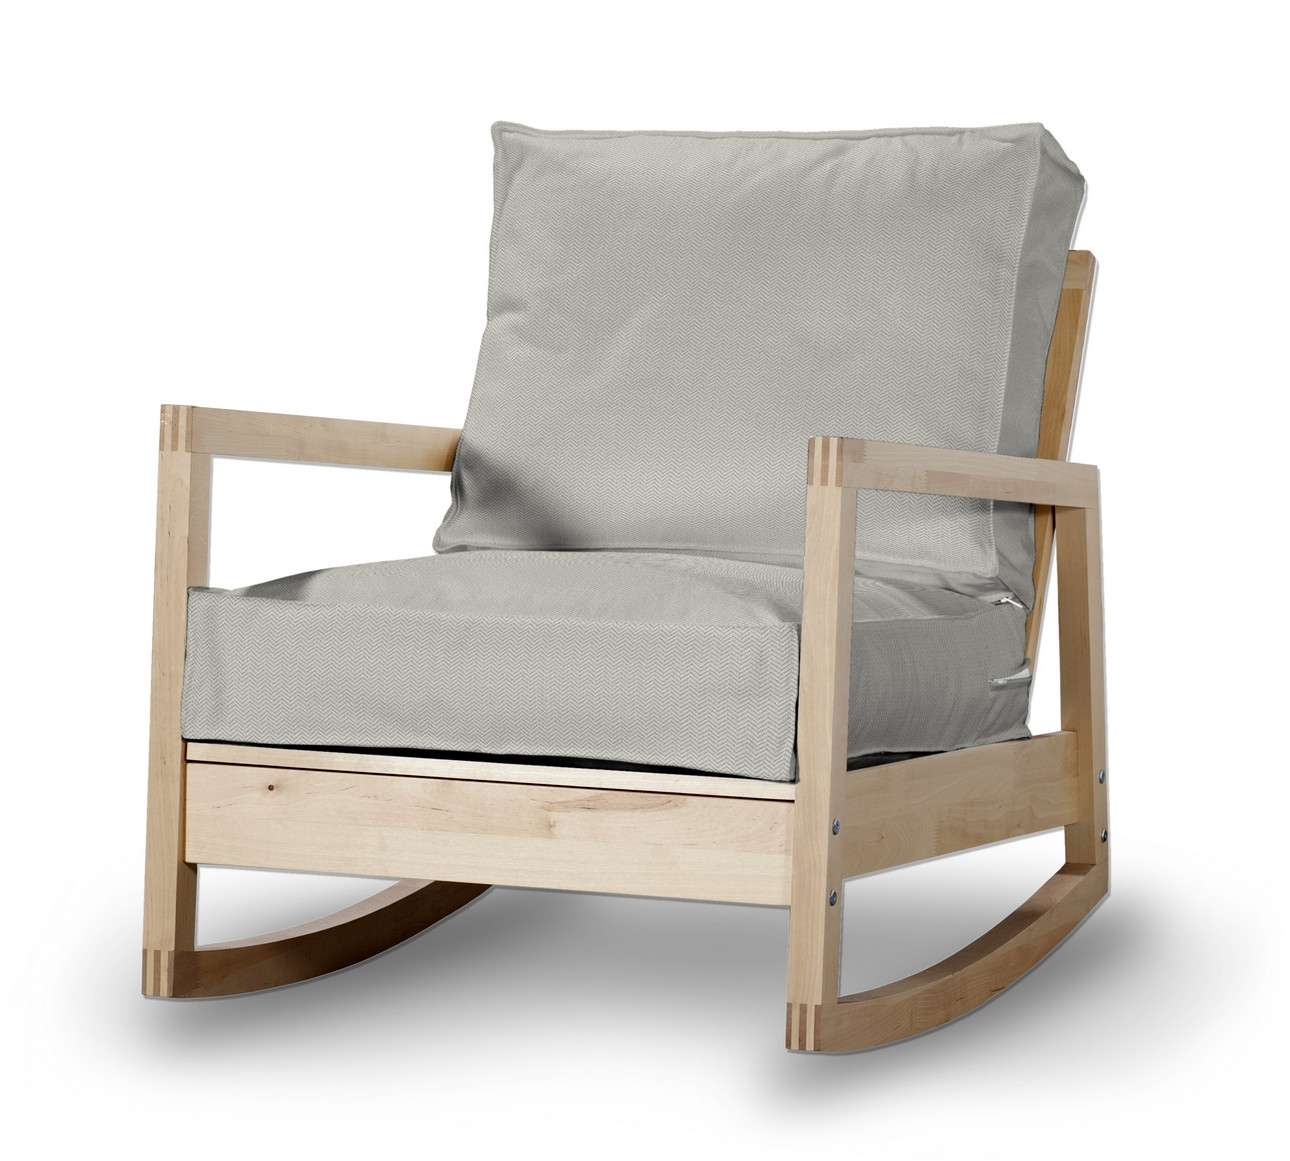 Pokrowiec na fotel Lillberg w kolekcji Bergen, tkanina: 161-84